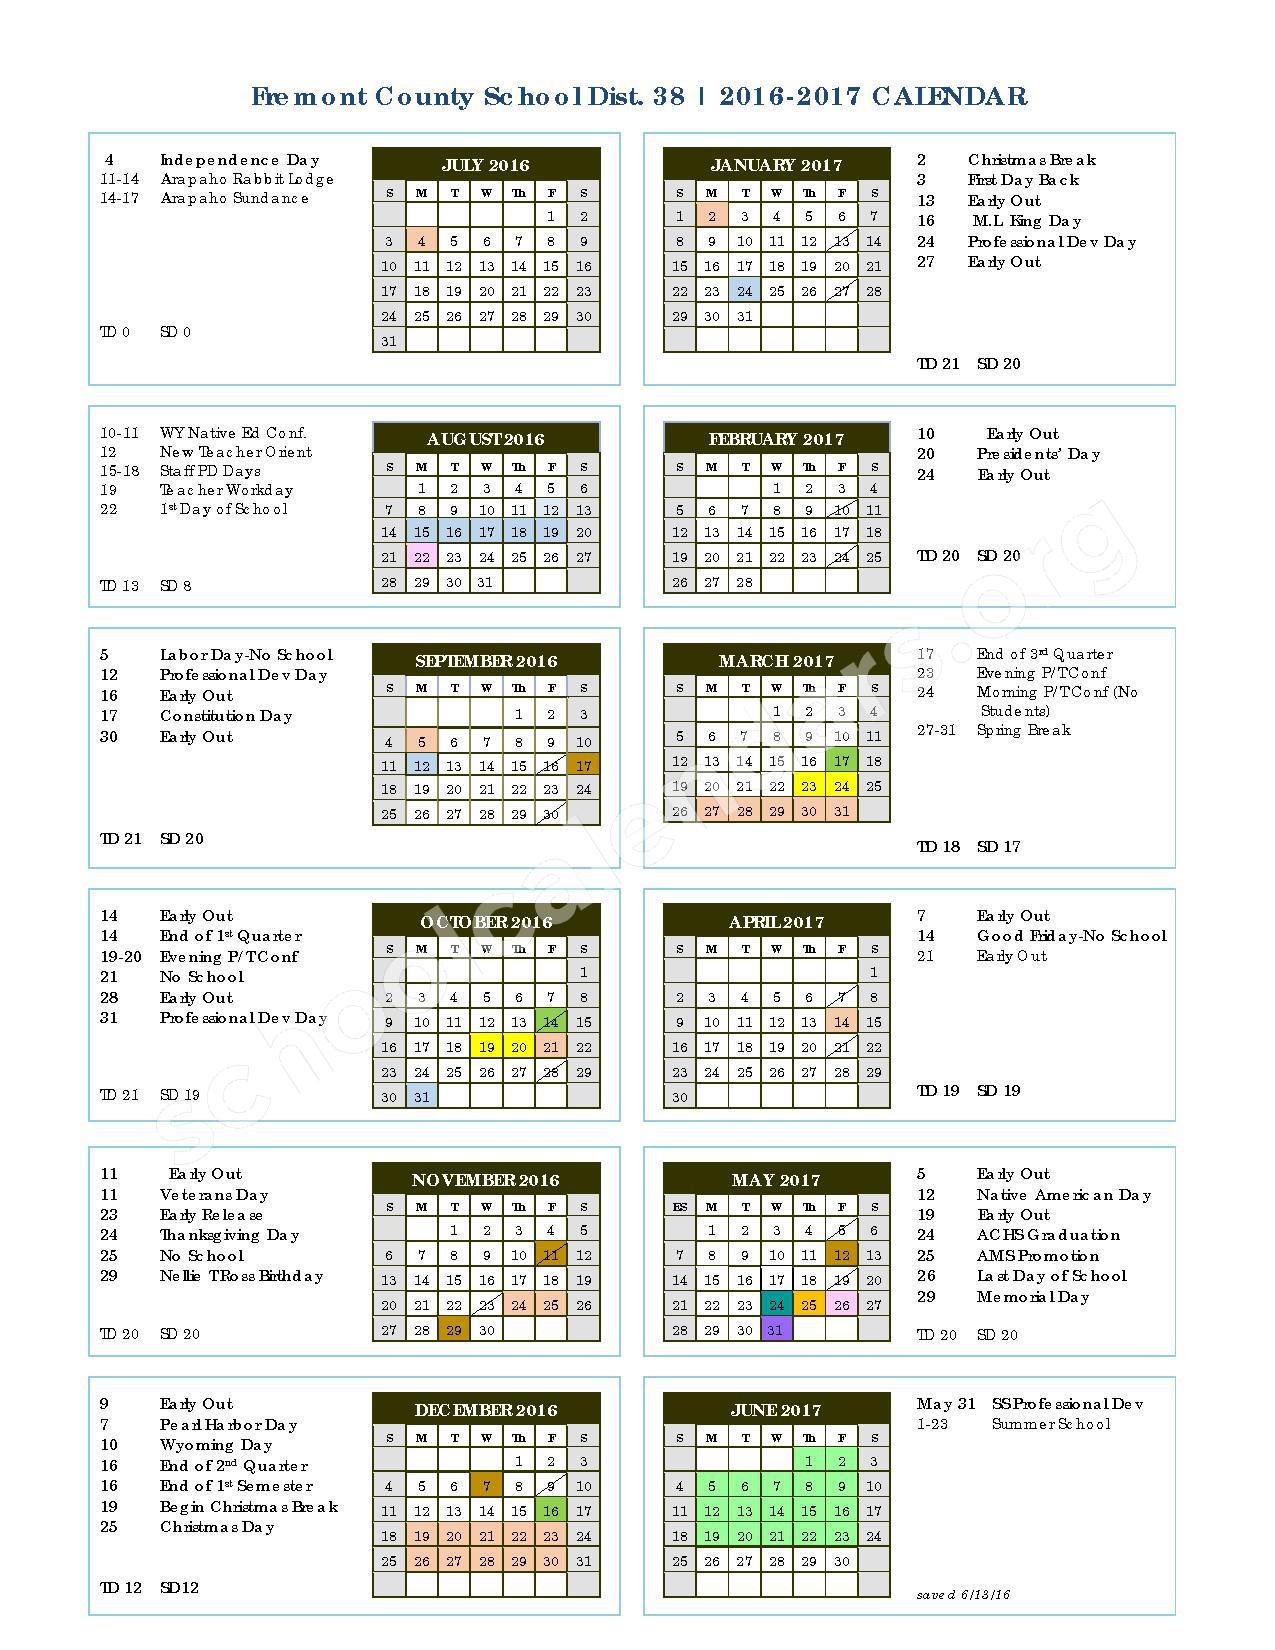 2016 - 2017 School Calendar – Fremont County School District #38 – page 1